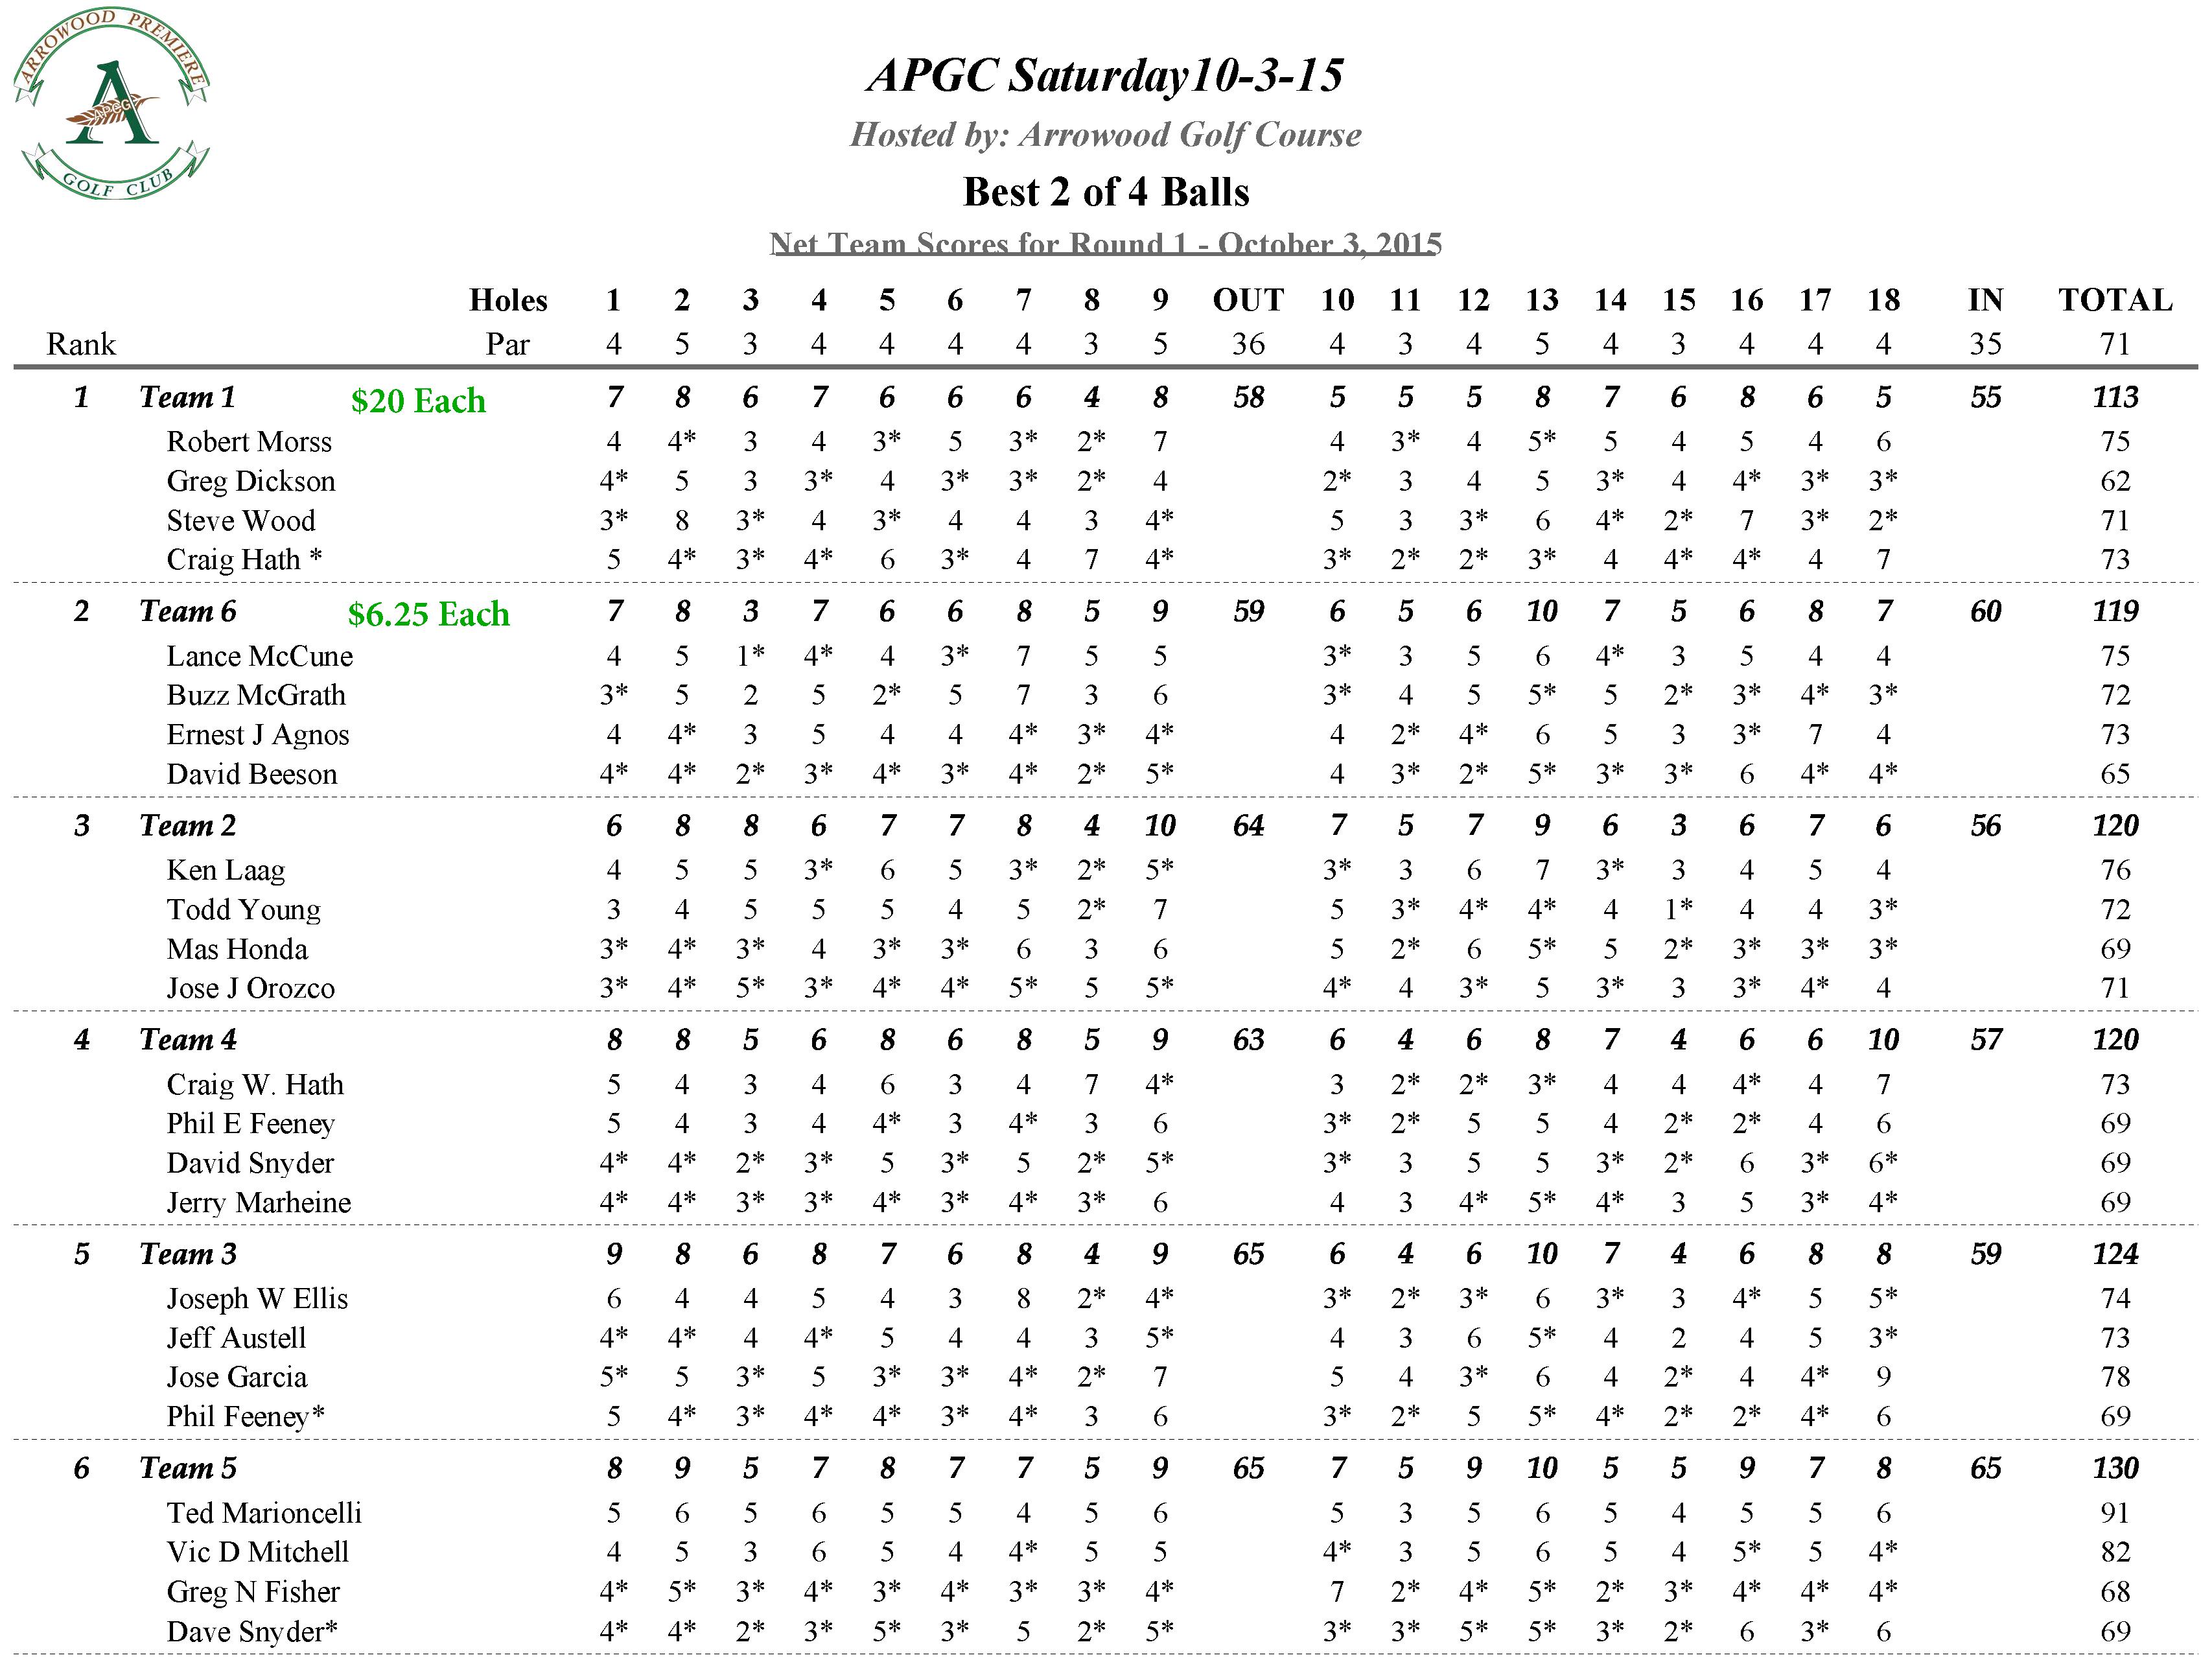 APGC Saturday 10-3-15